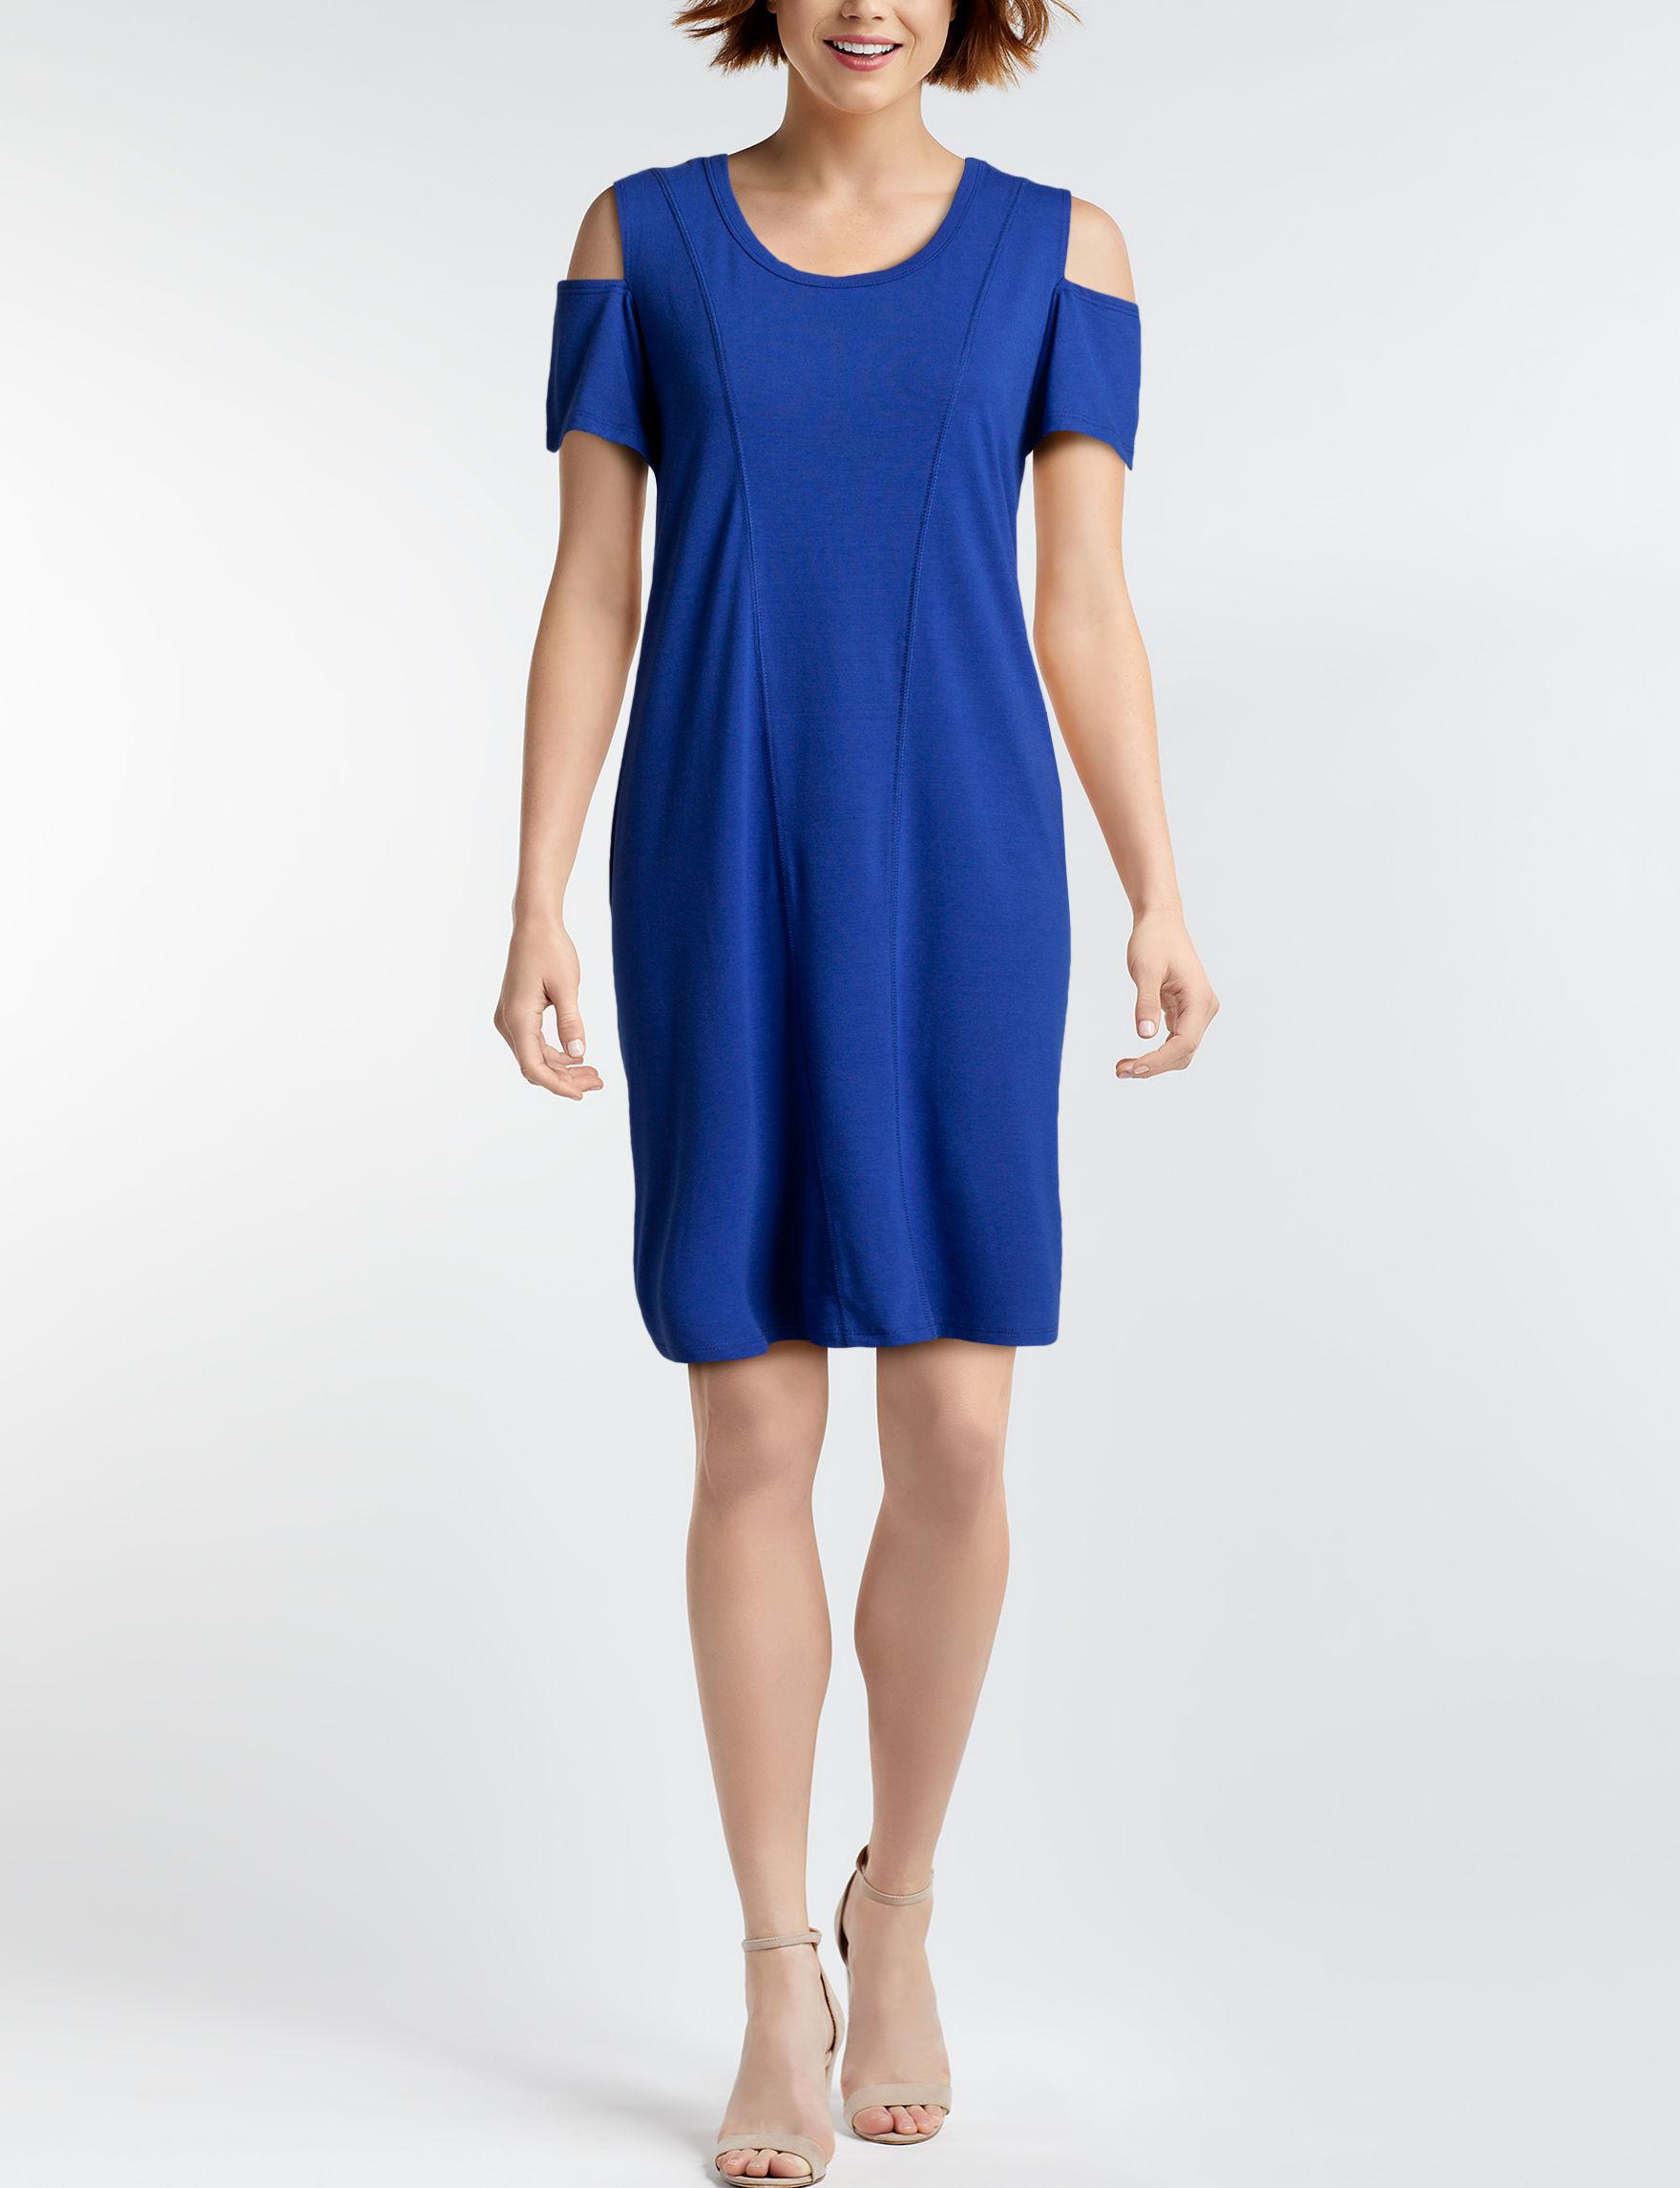 Nina Leonard Royal Blue Everyday & Casual